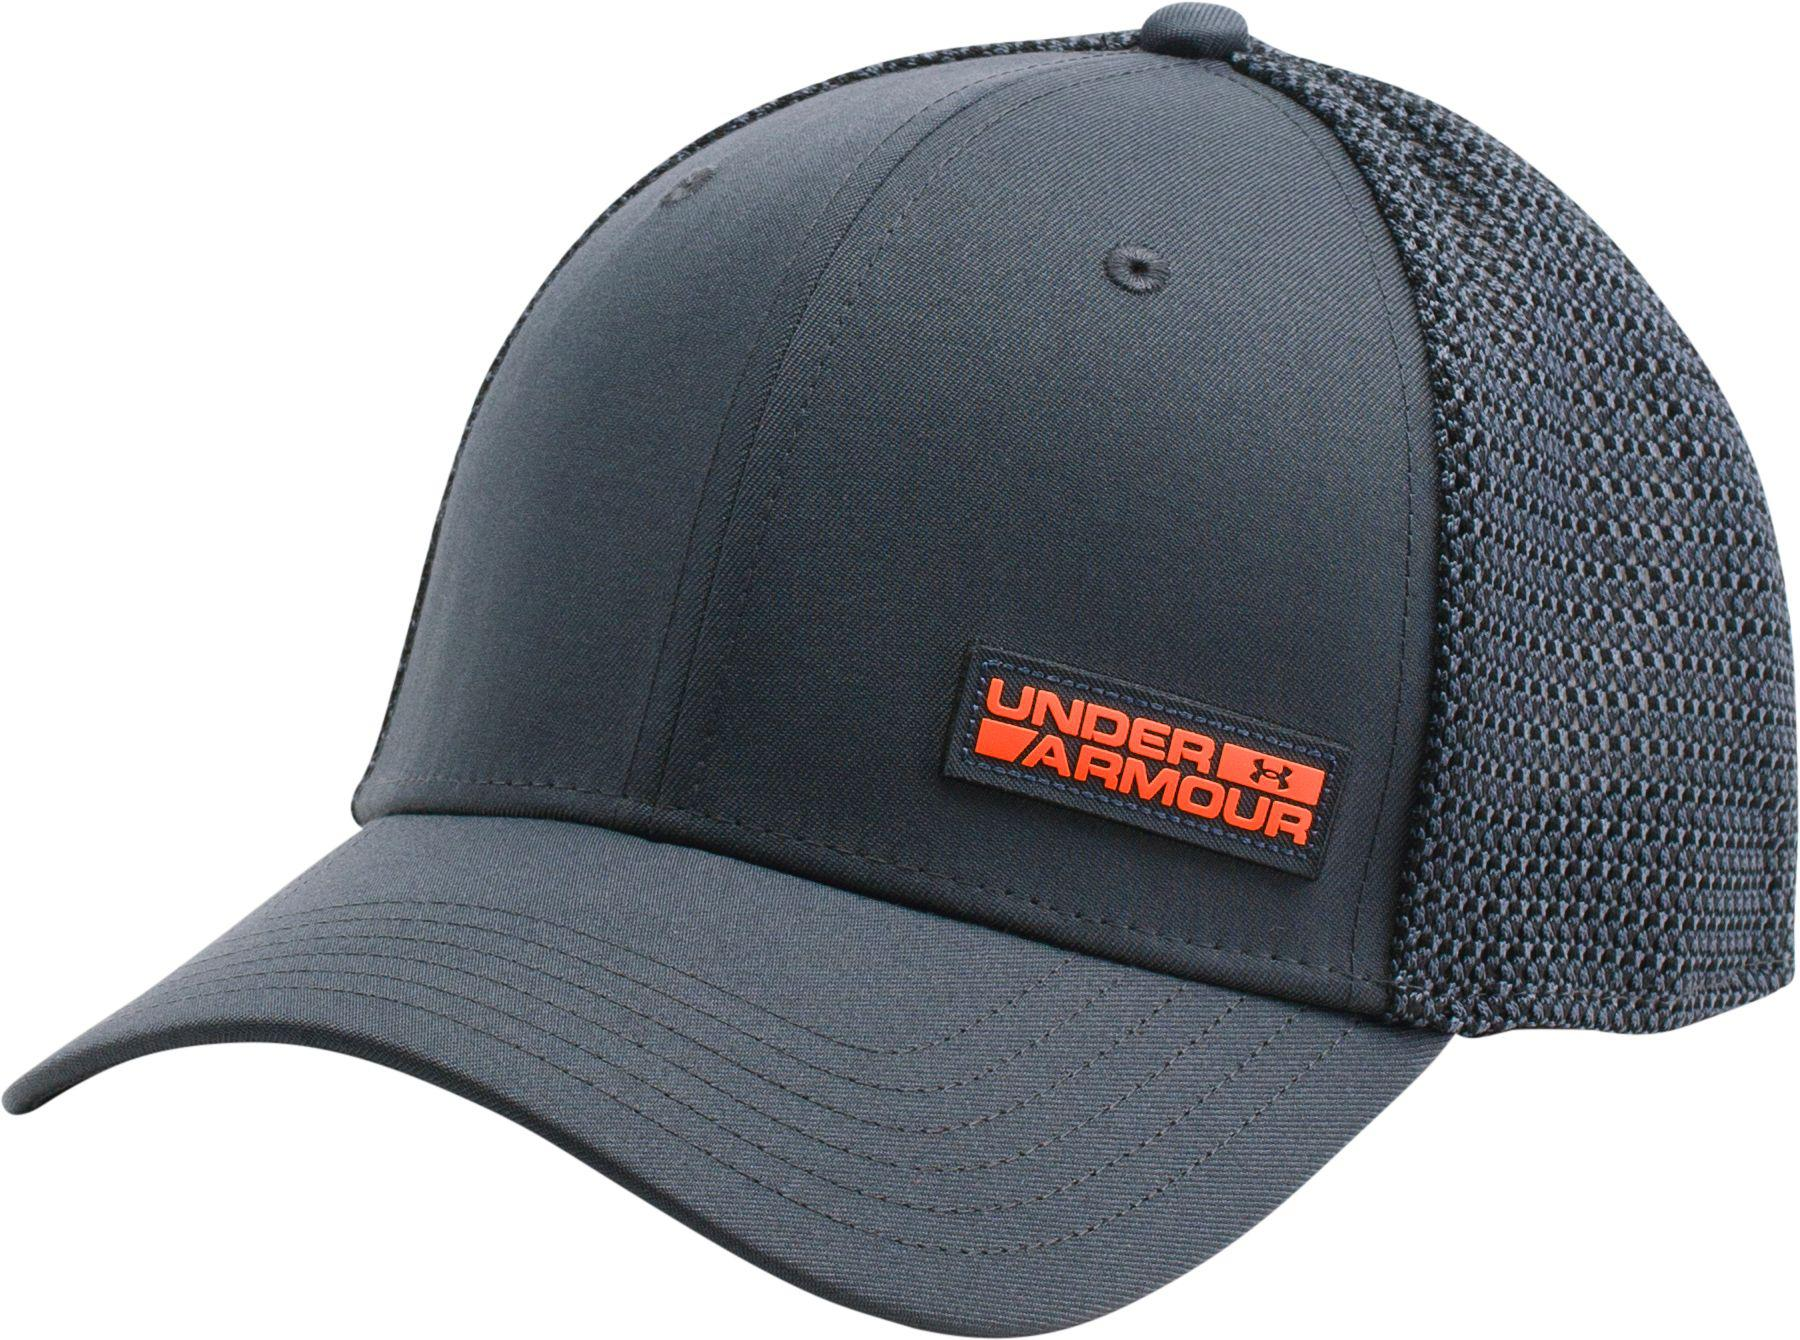 03b9449f050 Under Armour - Multicolor Twist Low Crown Hat for Men - Lyst